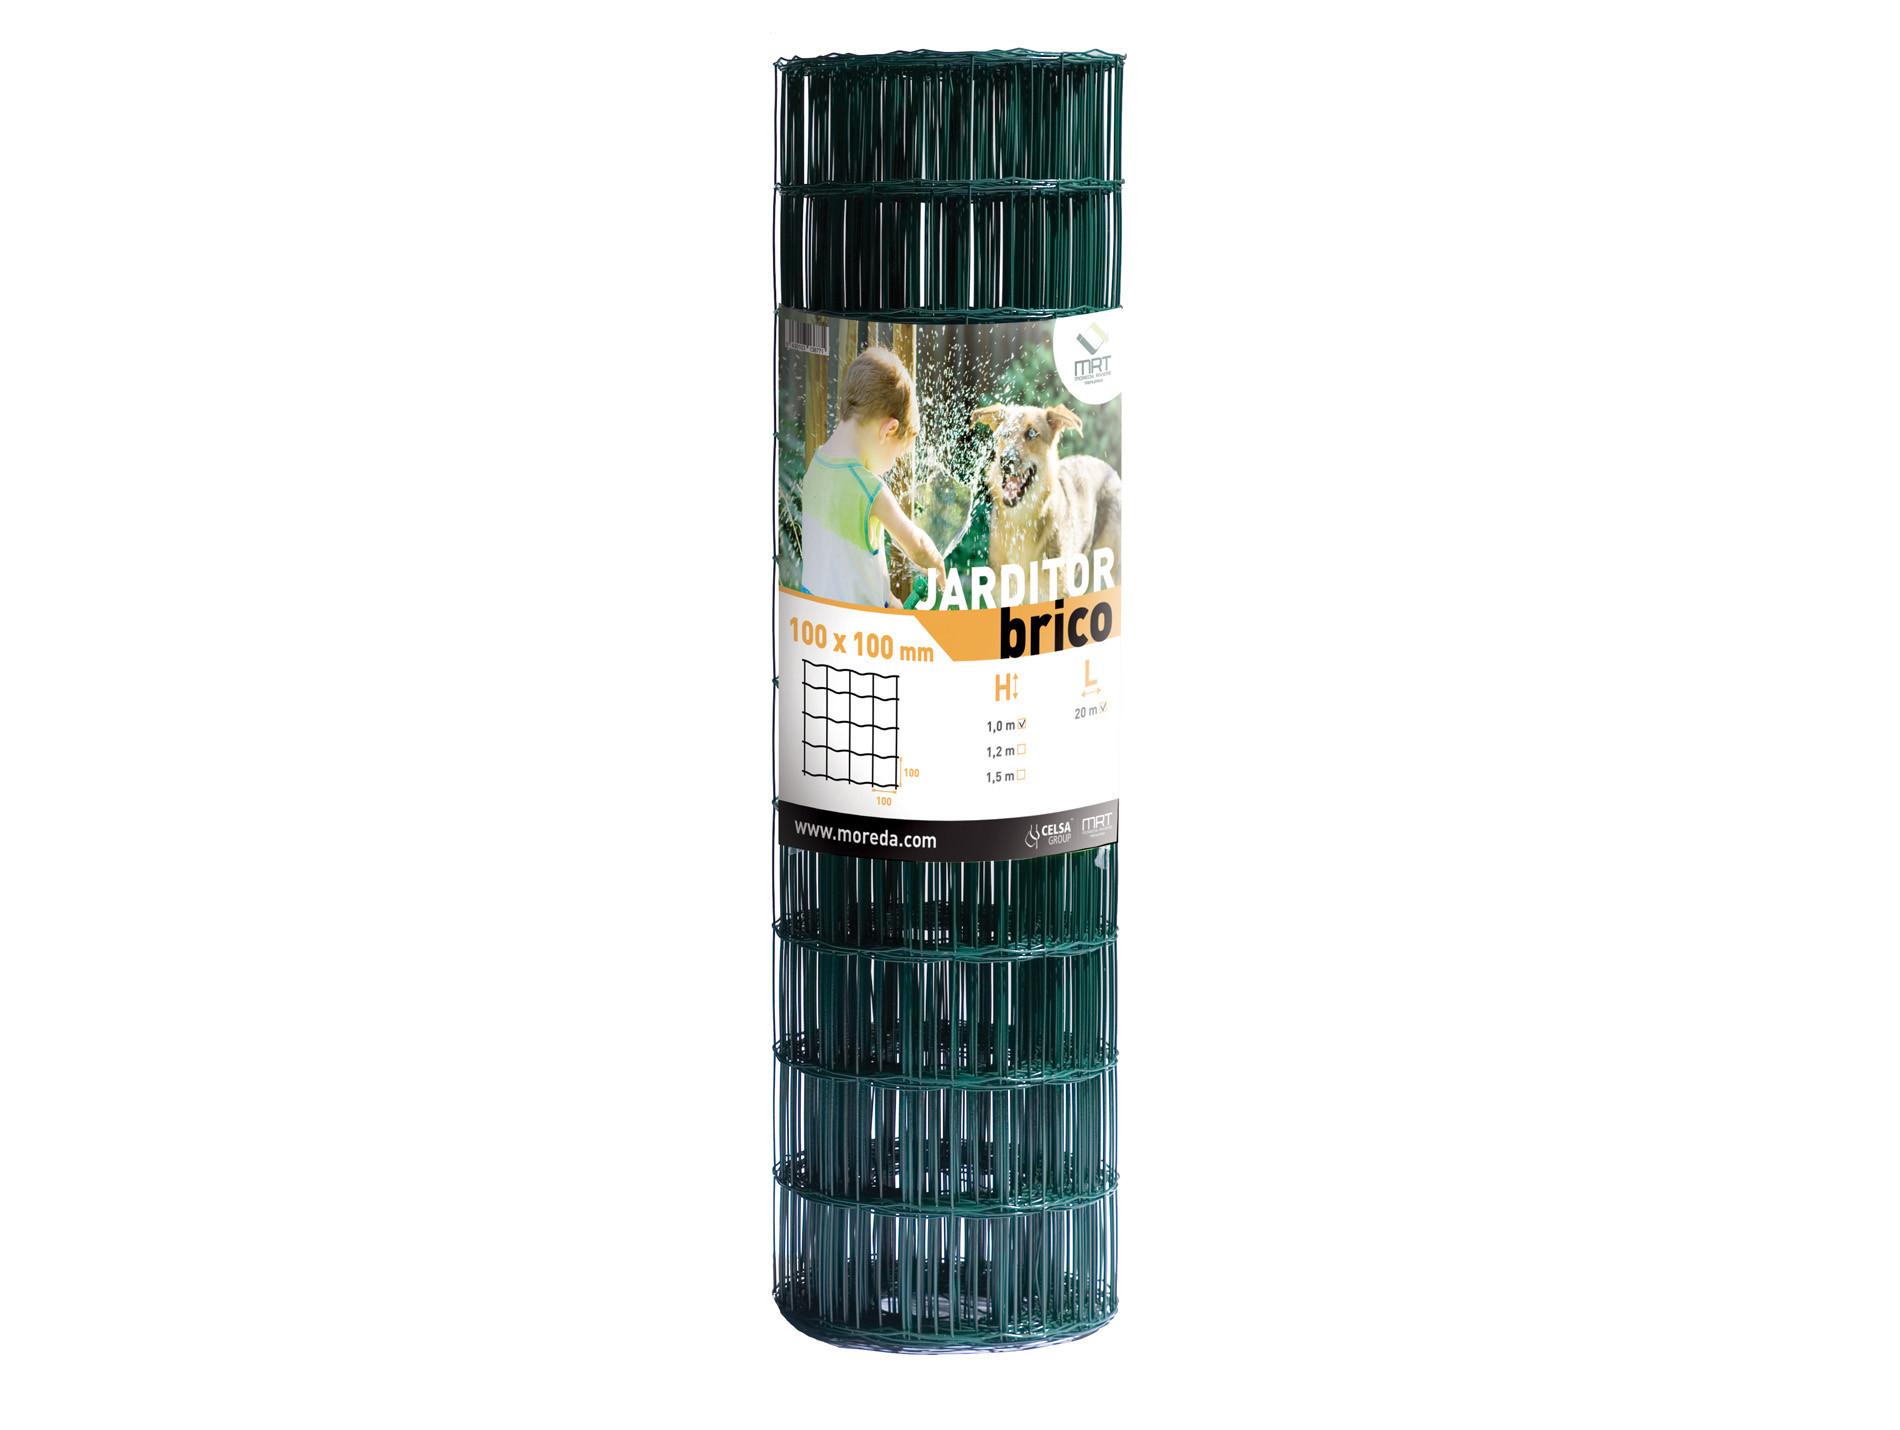 Grillage Jardi Brico vert 10x10 H1,50m L20m